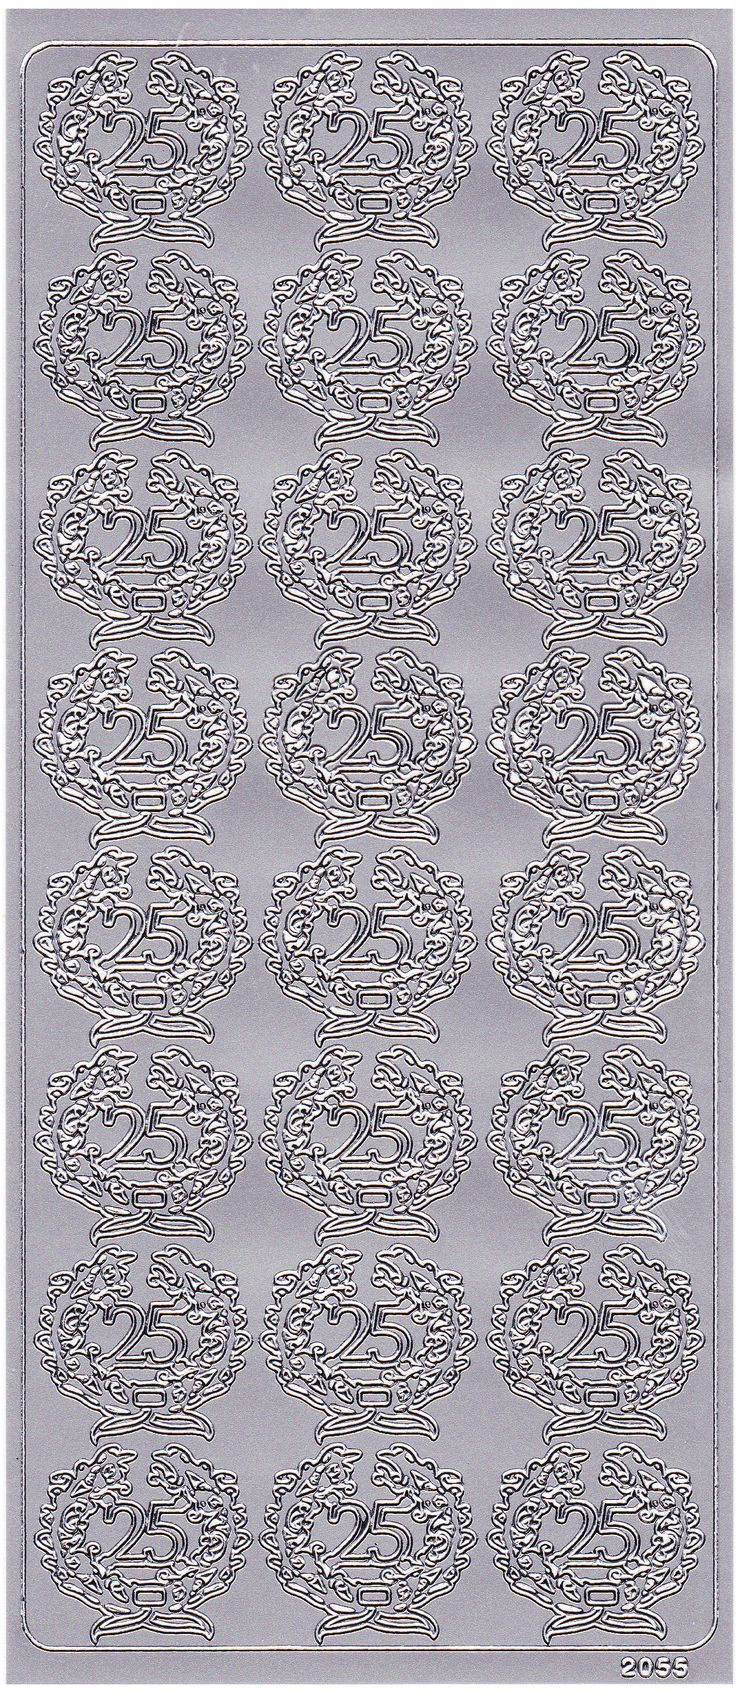 Sølv stickers med tallet 25 fra Sjovogkreativ.dk til sølvbryllup, 25 års jubilæum og 25 års fødselsdag.